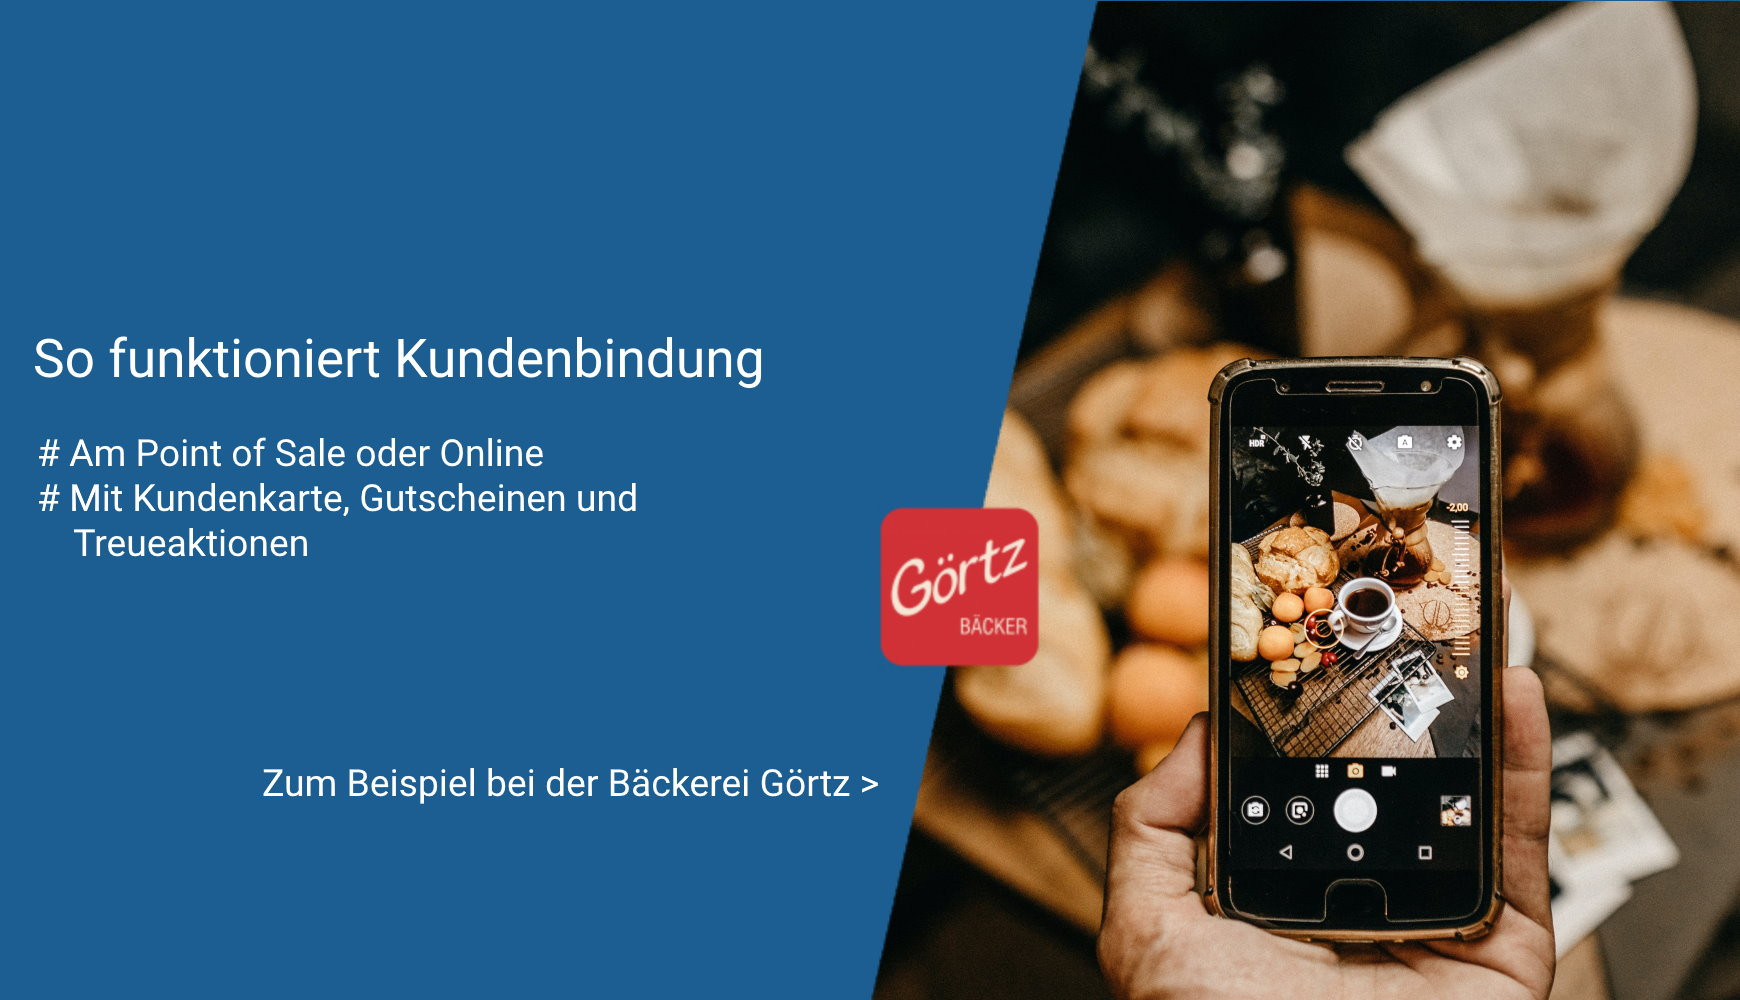 Kundenbindung-App